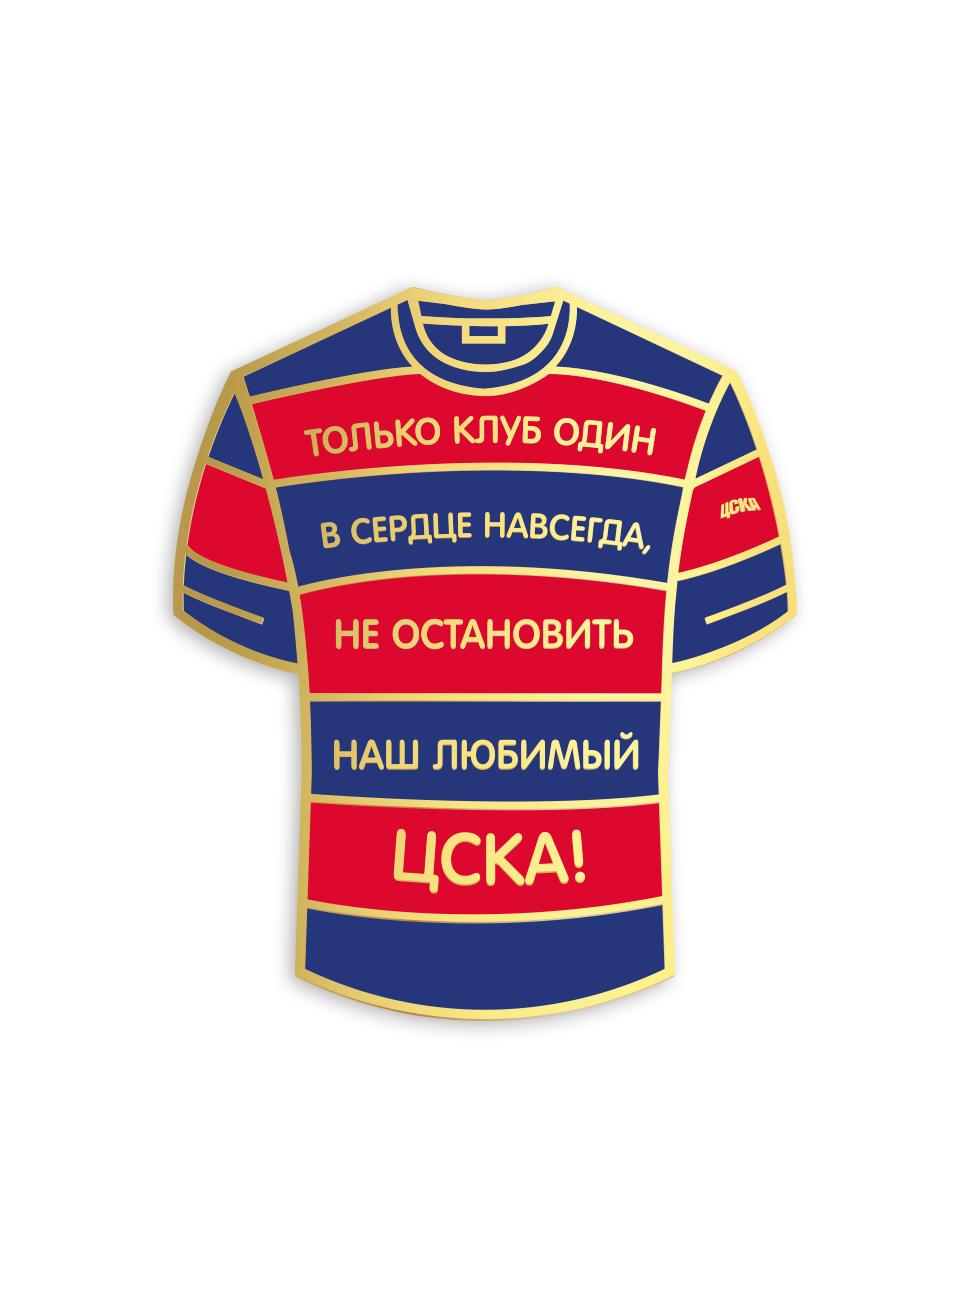 Значок ФУТБОЛКА ПФК ЦСКА